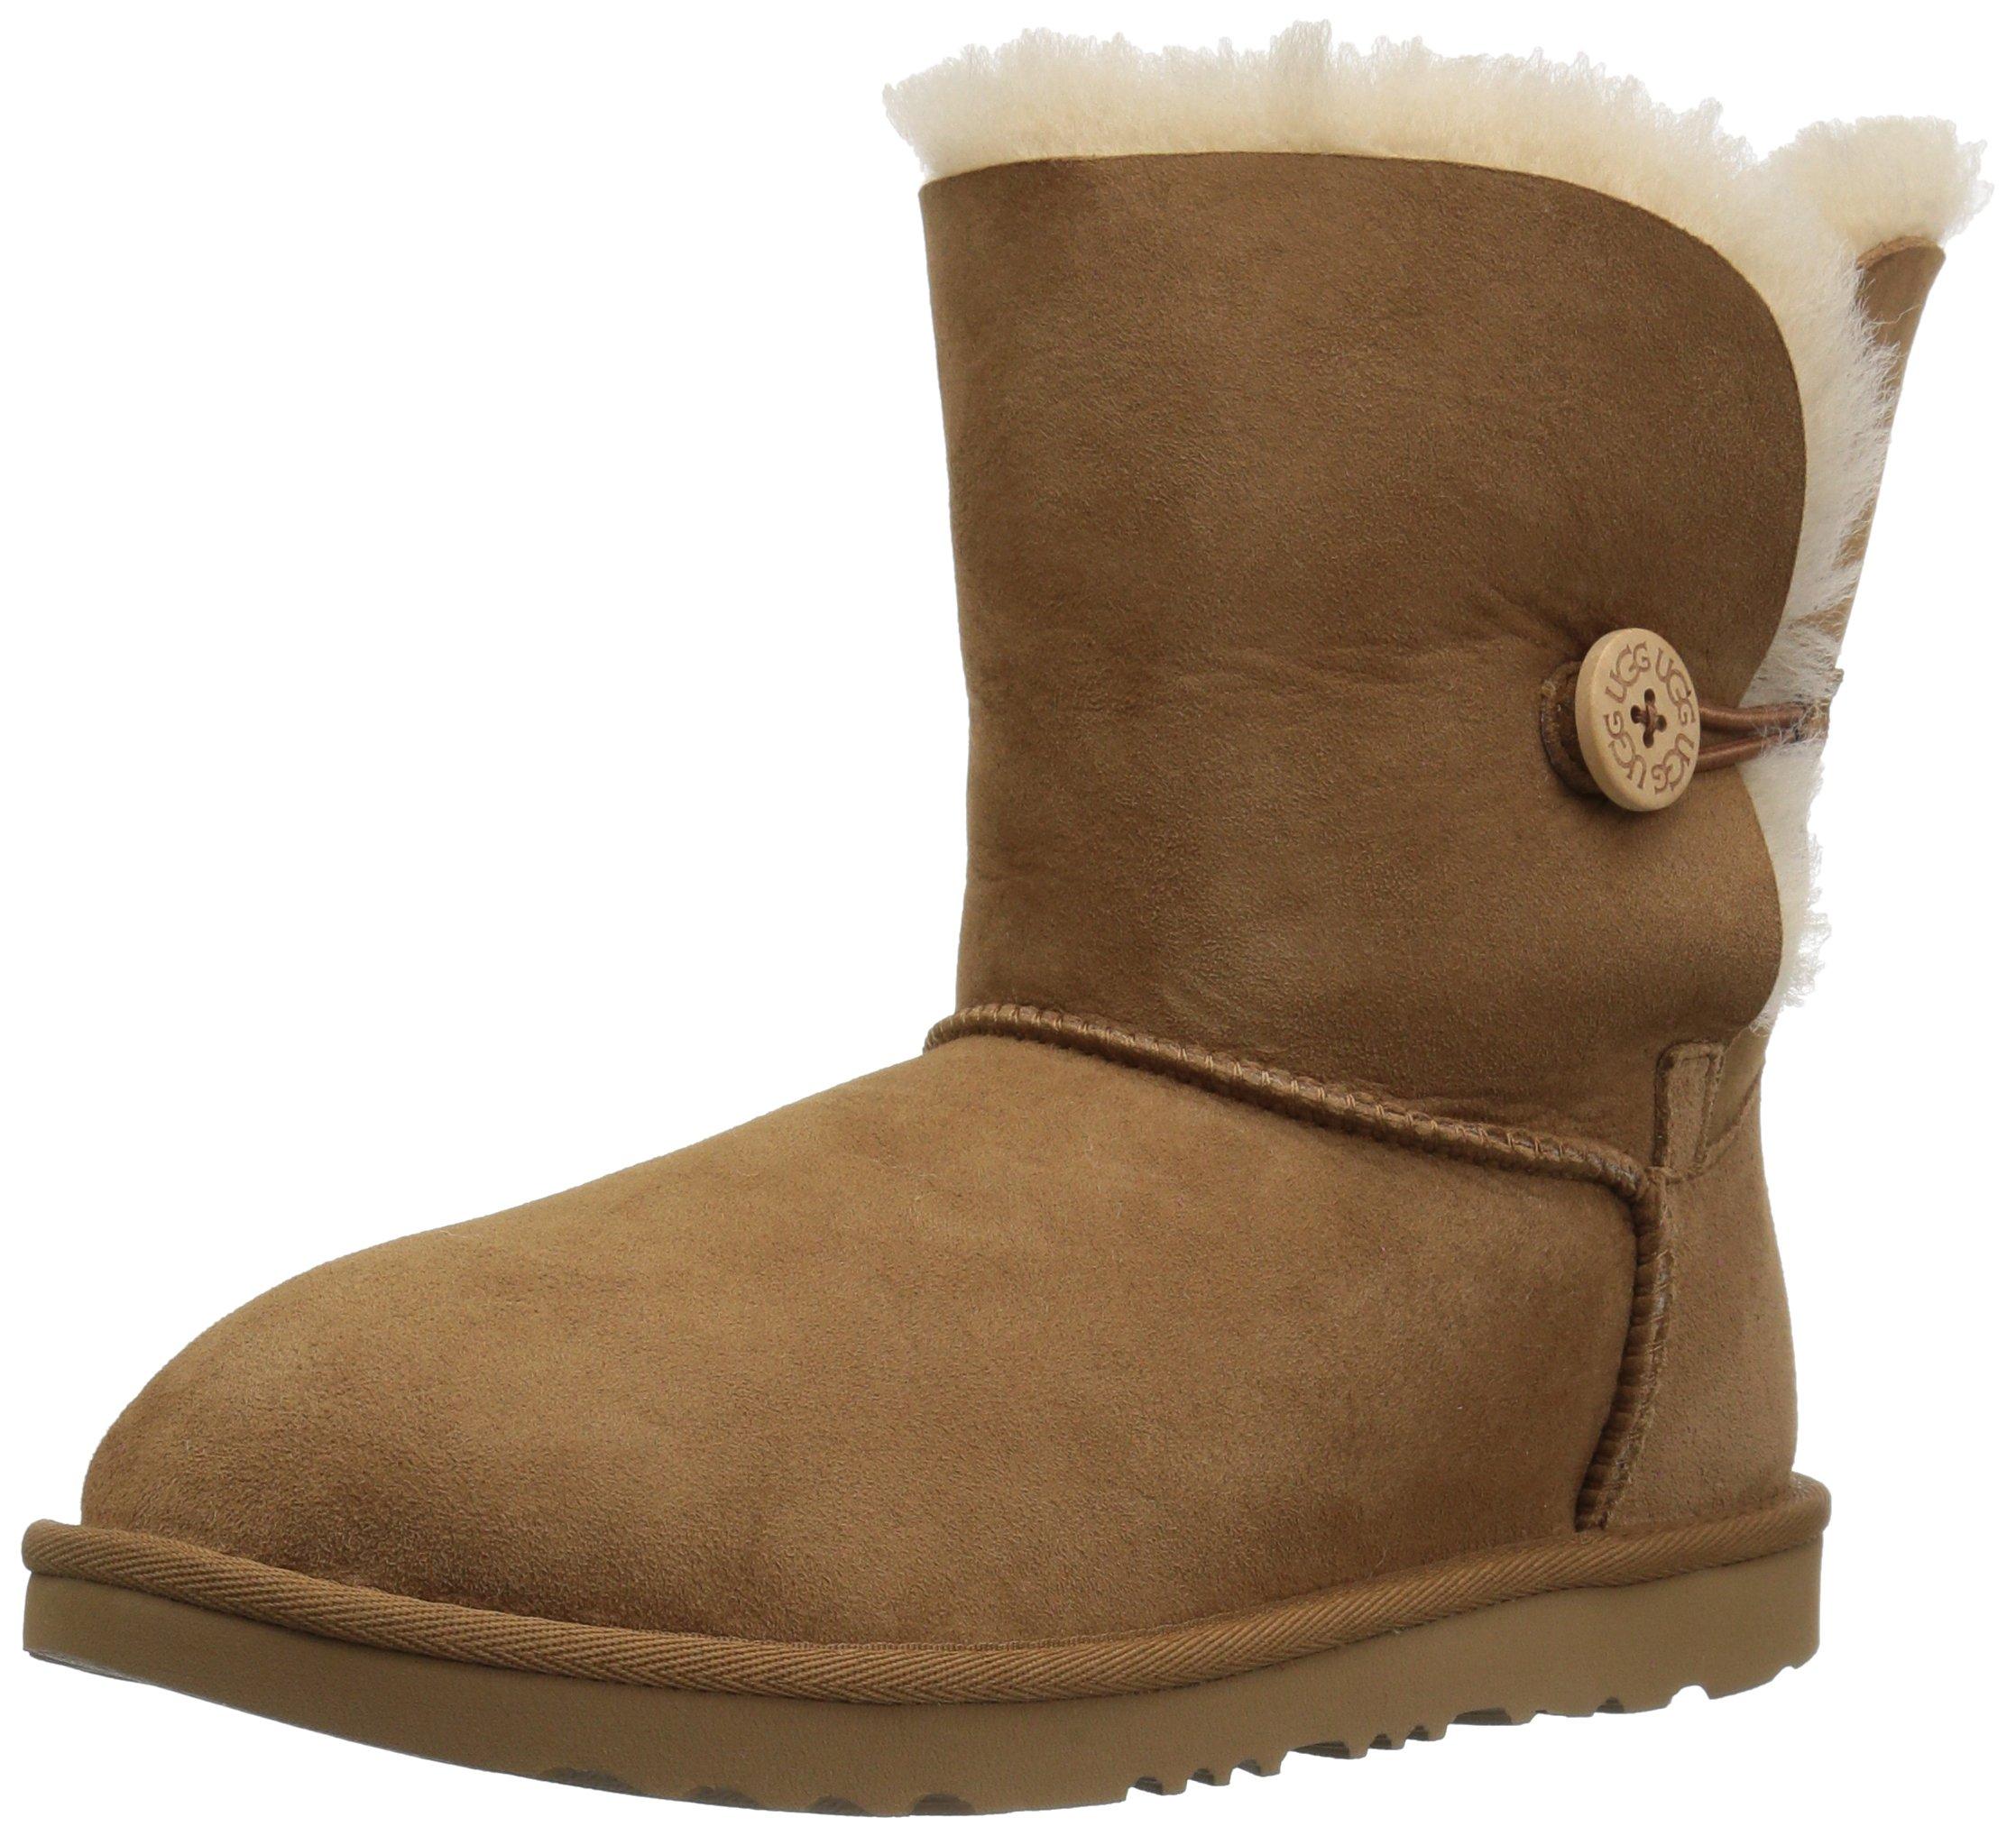 UGG Girls K Bailey Button II Fashion Boot, Chestnut, 5 M US Big Kid